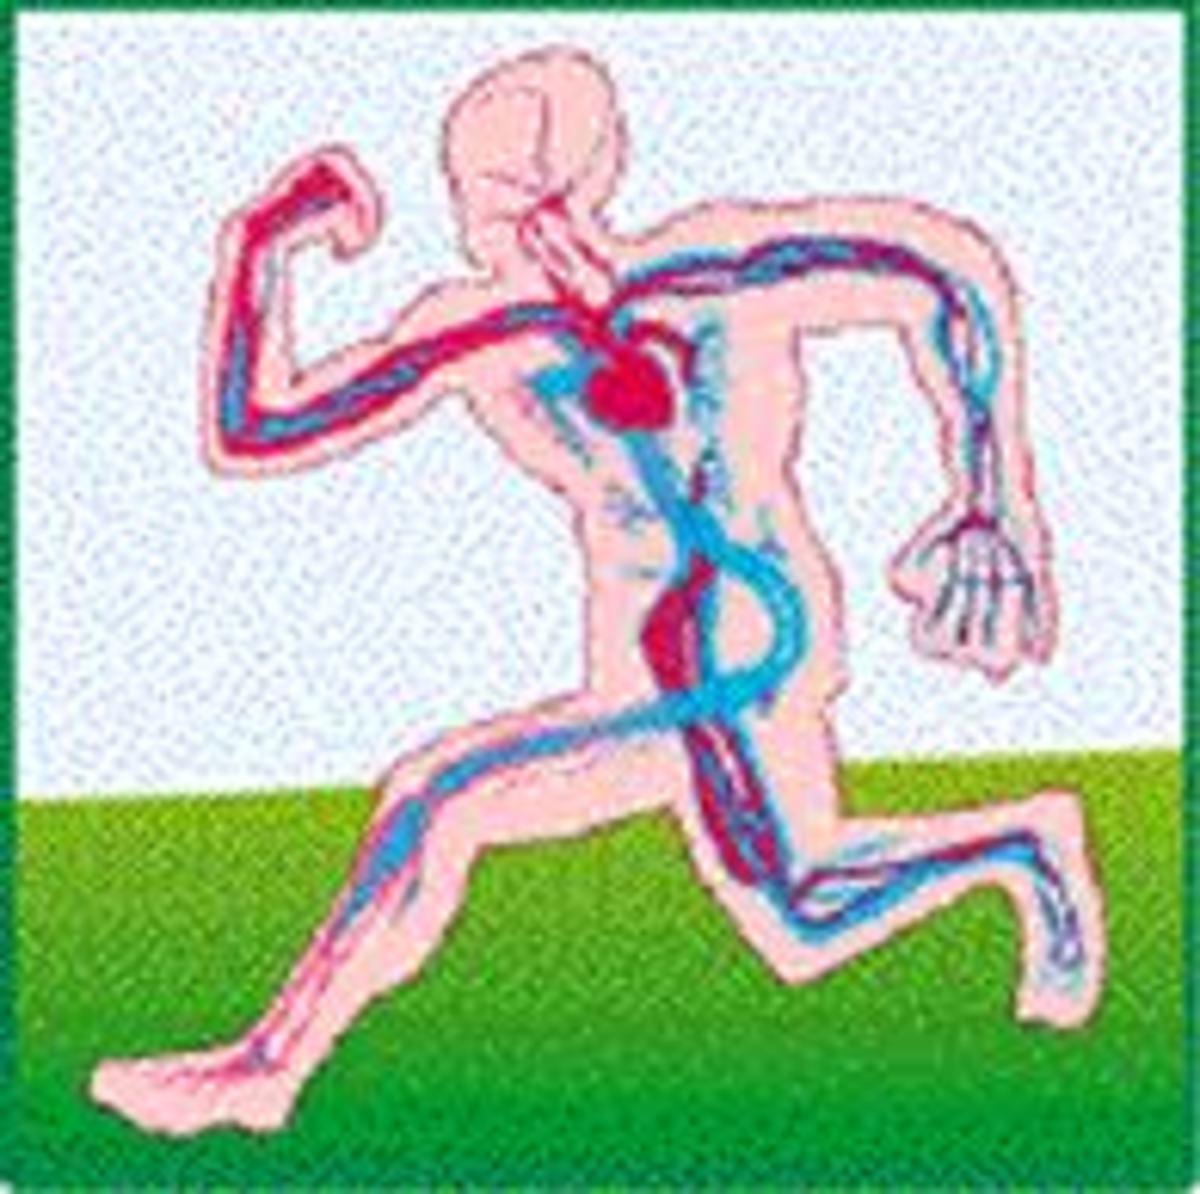 Body's circulatory system